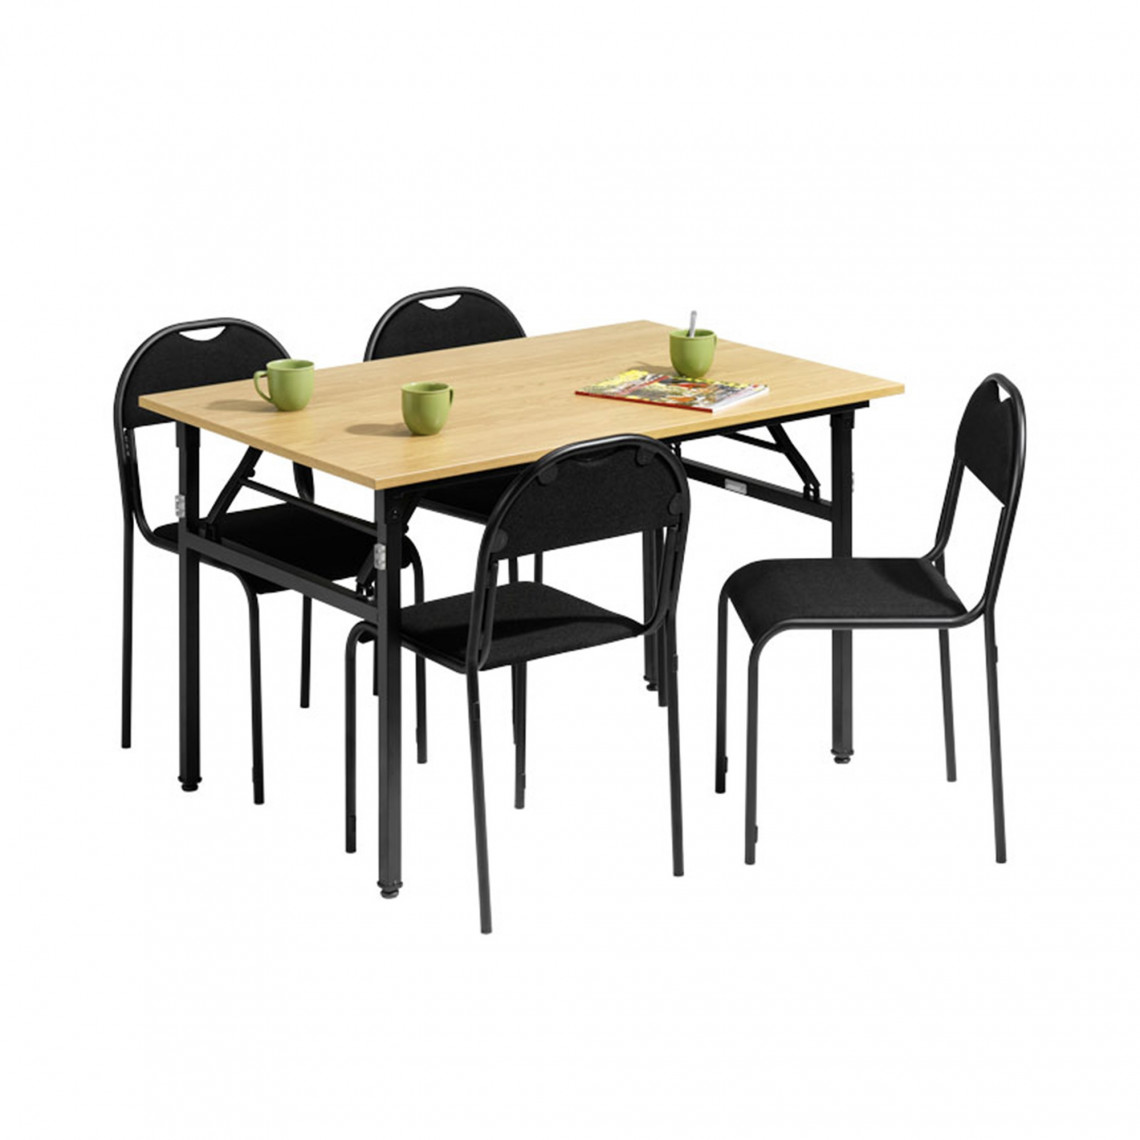 Lunchgrupp 4 pers - RX002 & Starko bord